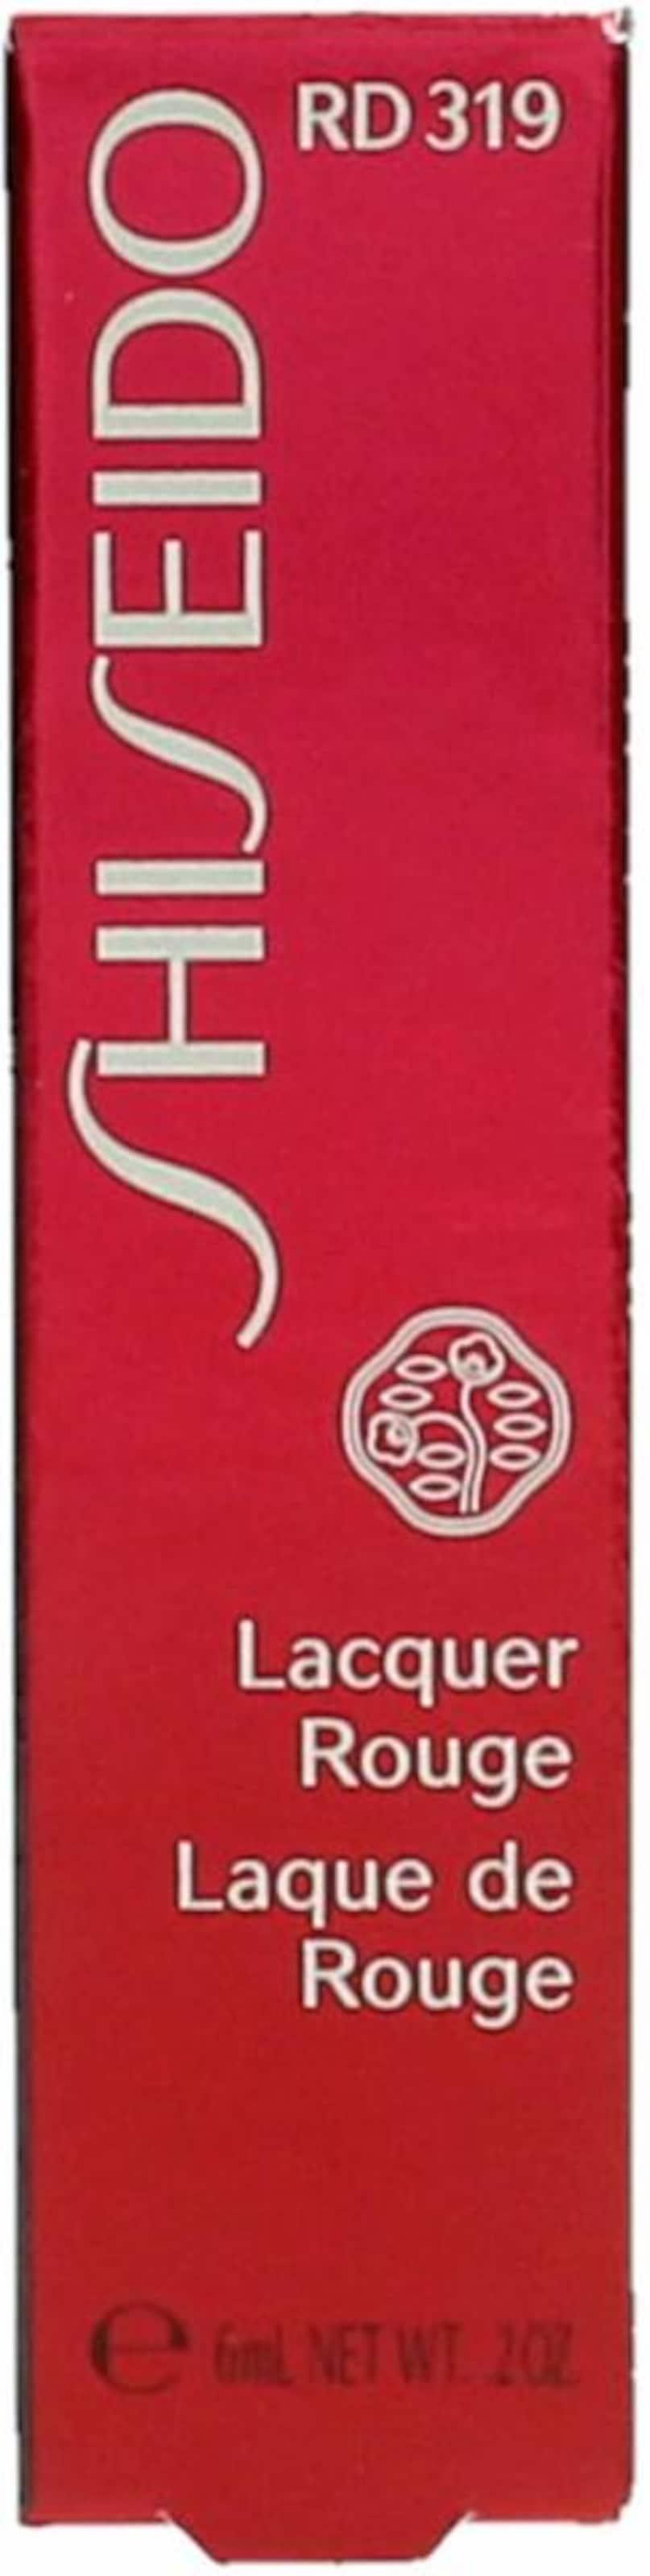 SHISEIDO 'Lacquer Rouge', Lipgloss